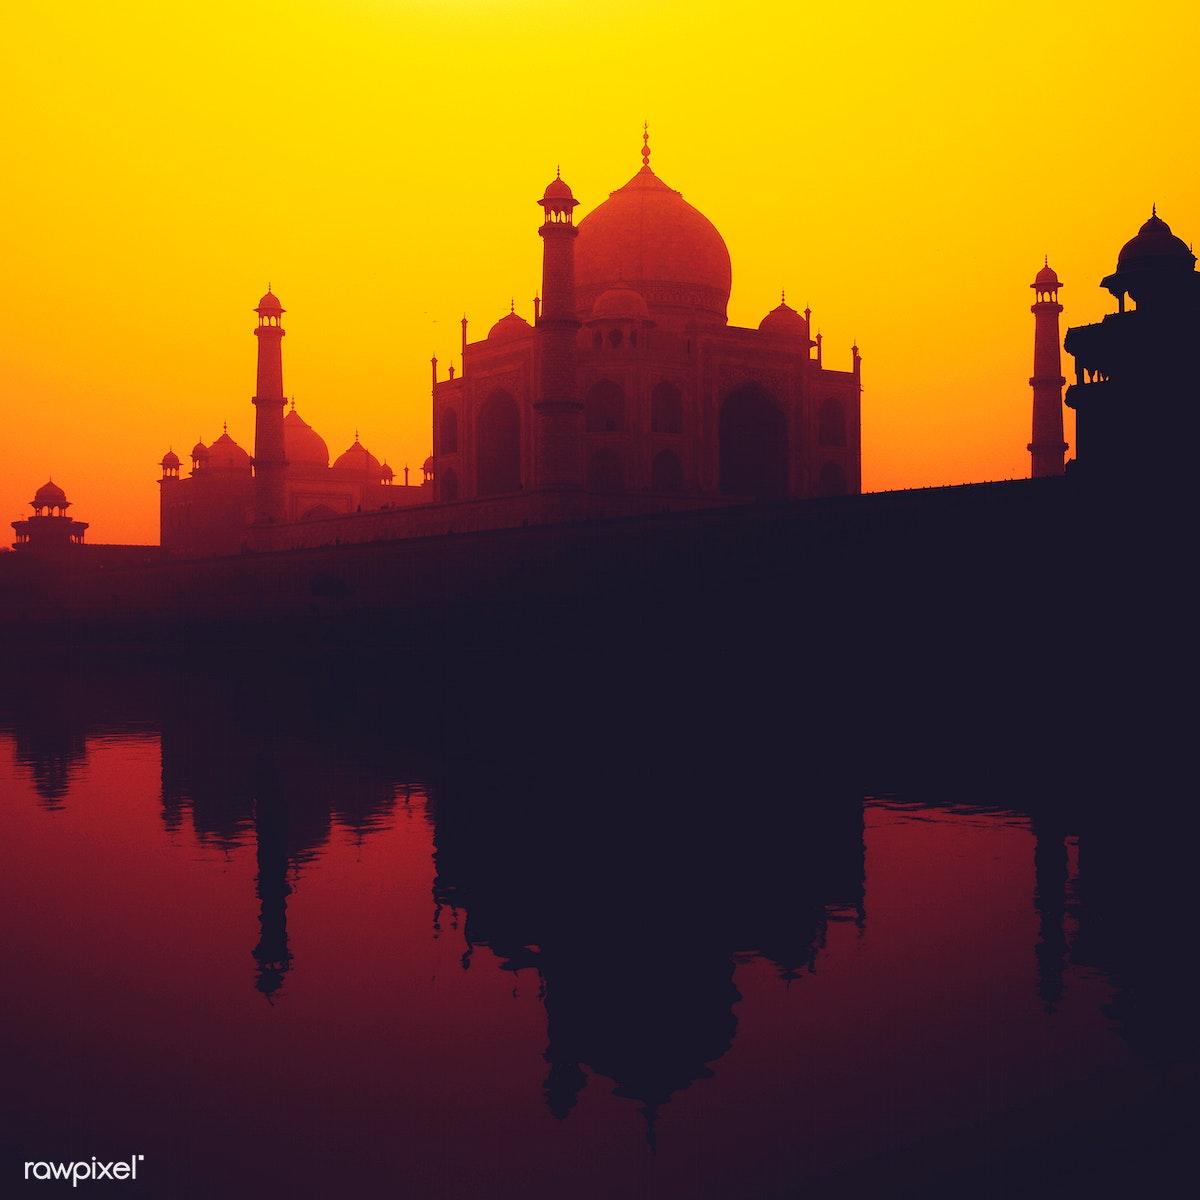 Download Premium Image Of Sunset Silhouette Of A Grand Taj Mahal 81177